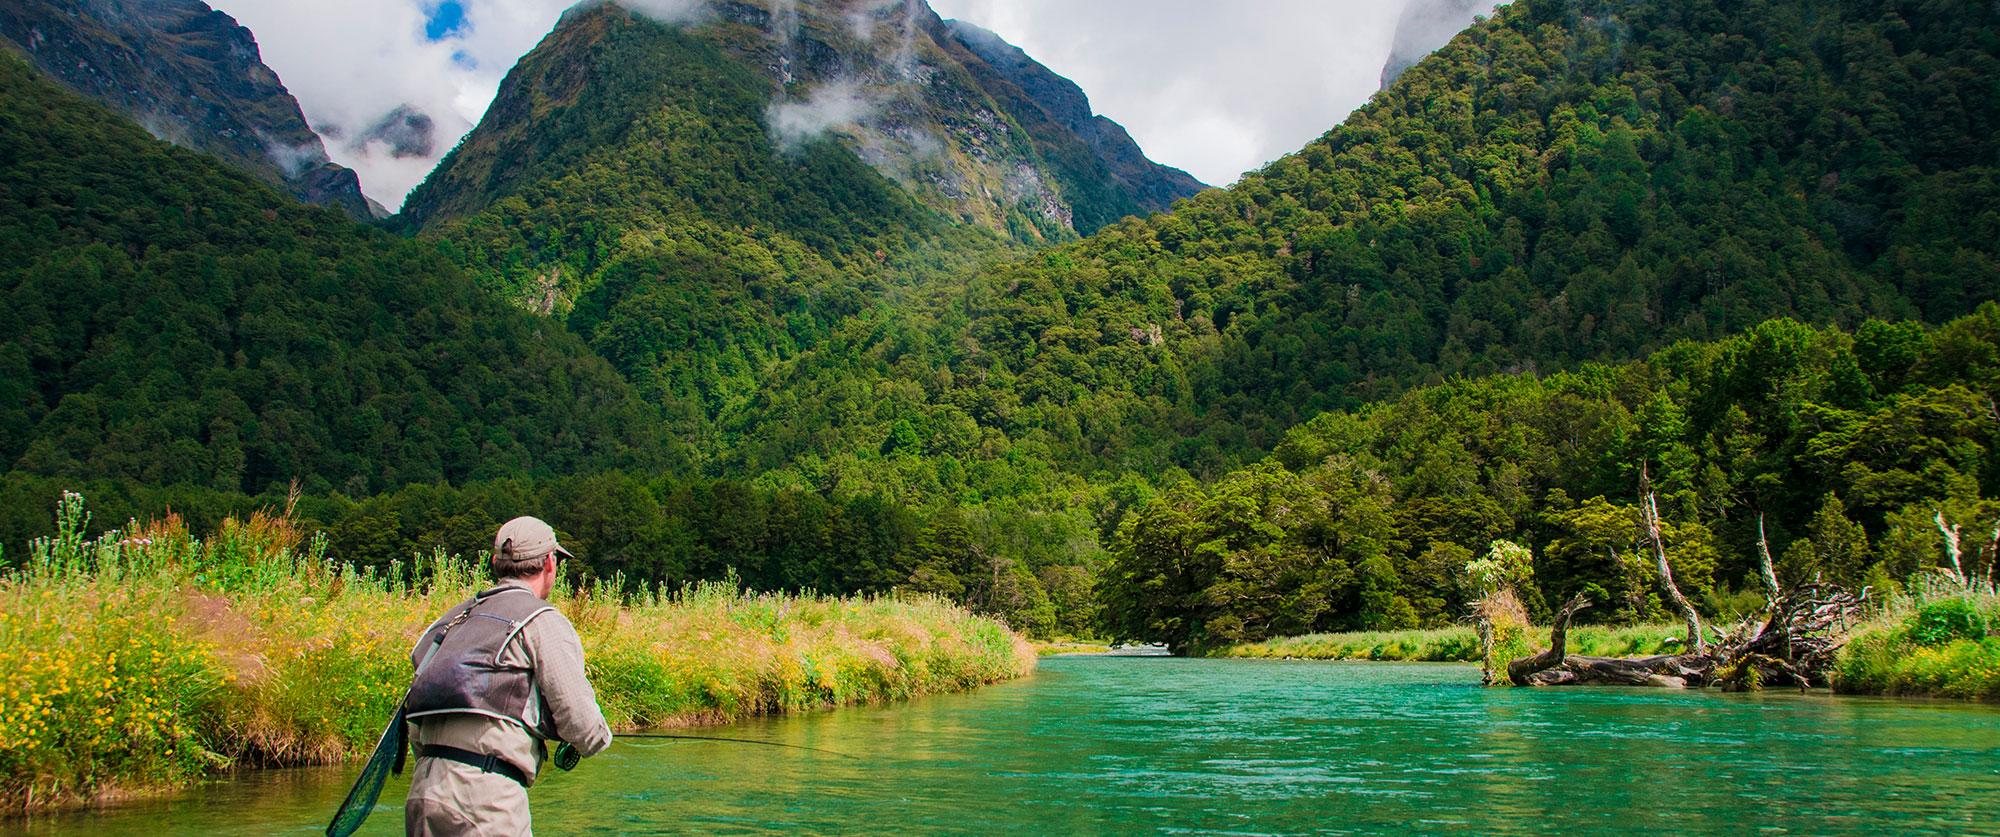 Custom-Built Australia and New Zealand Fishing Vacation - Trout Fishing in Fiordland National Park, New Zealand